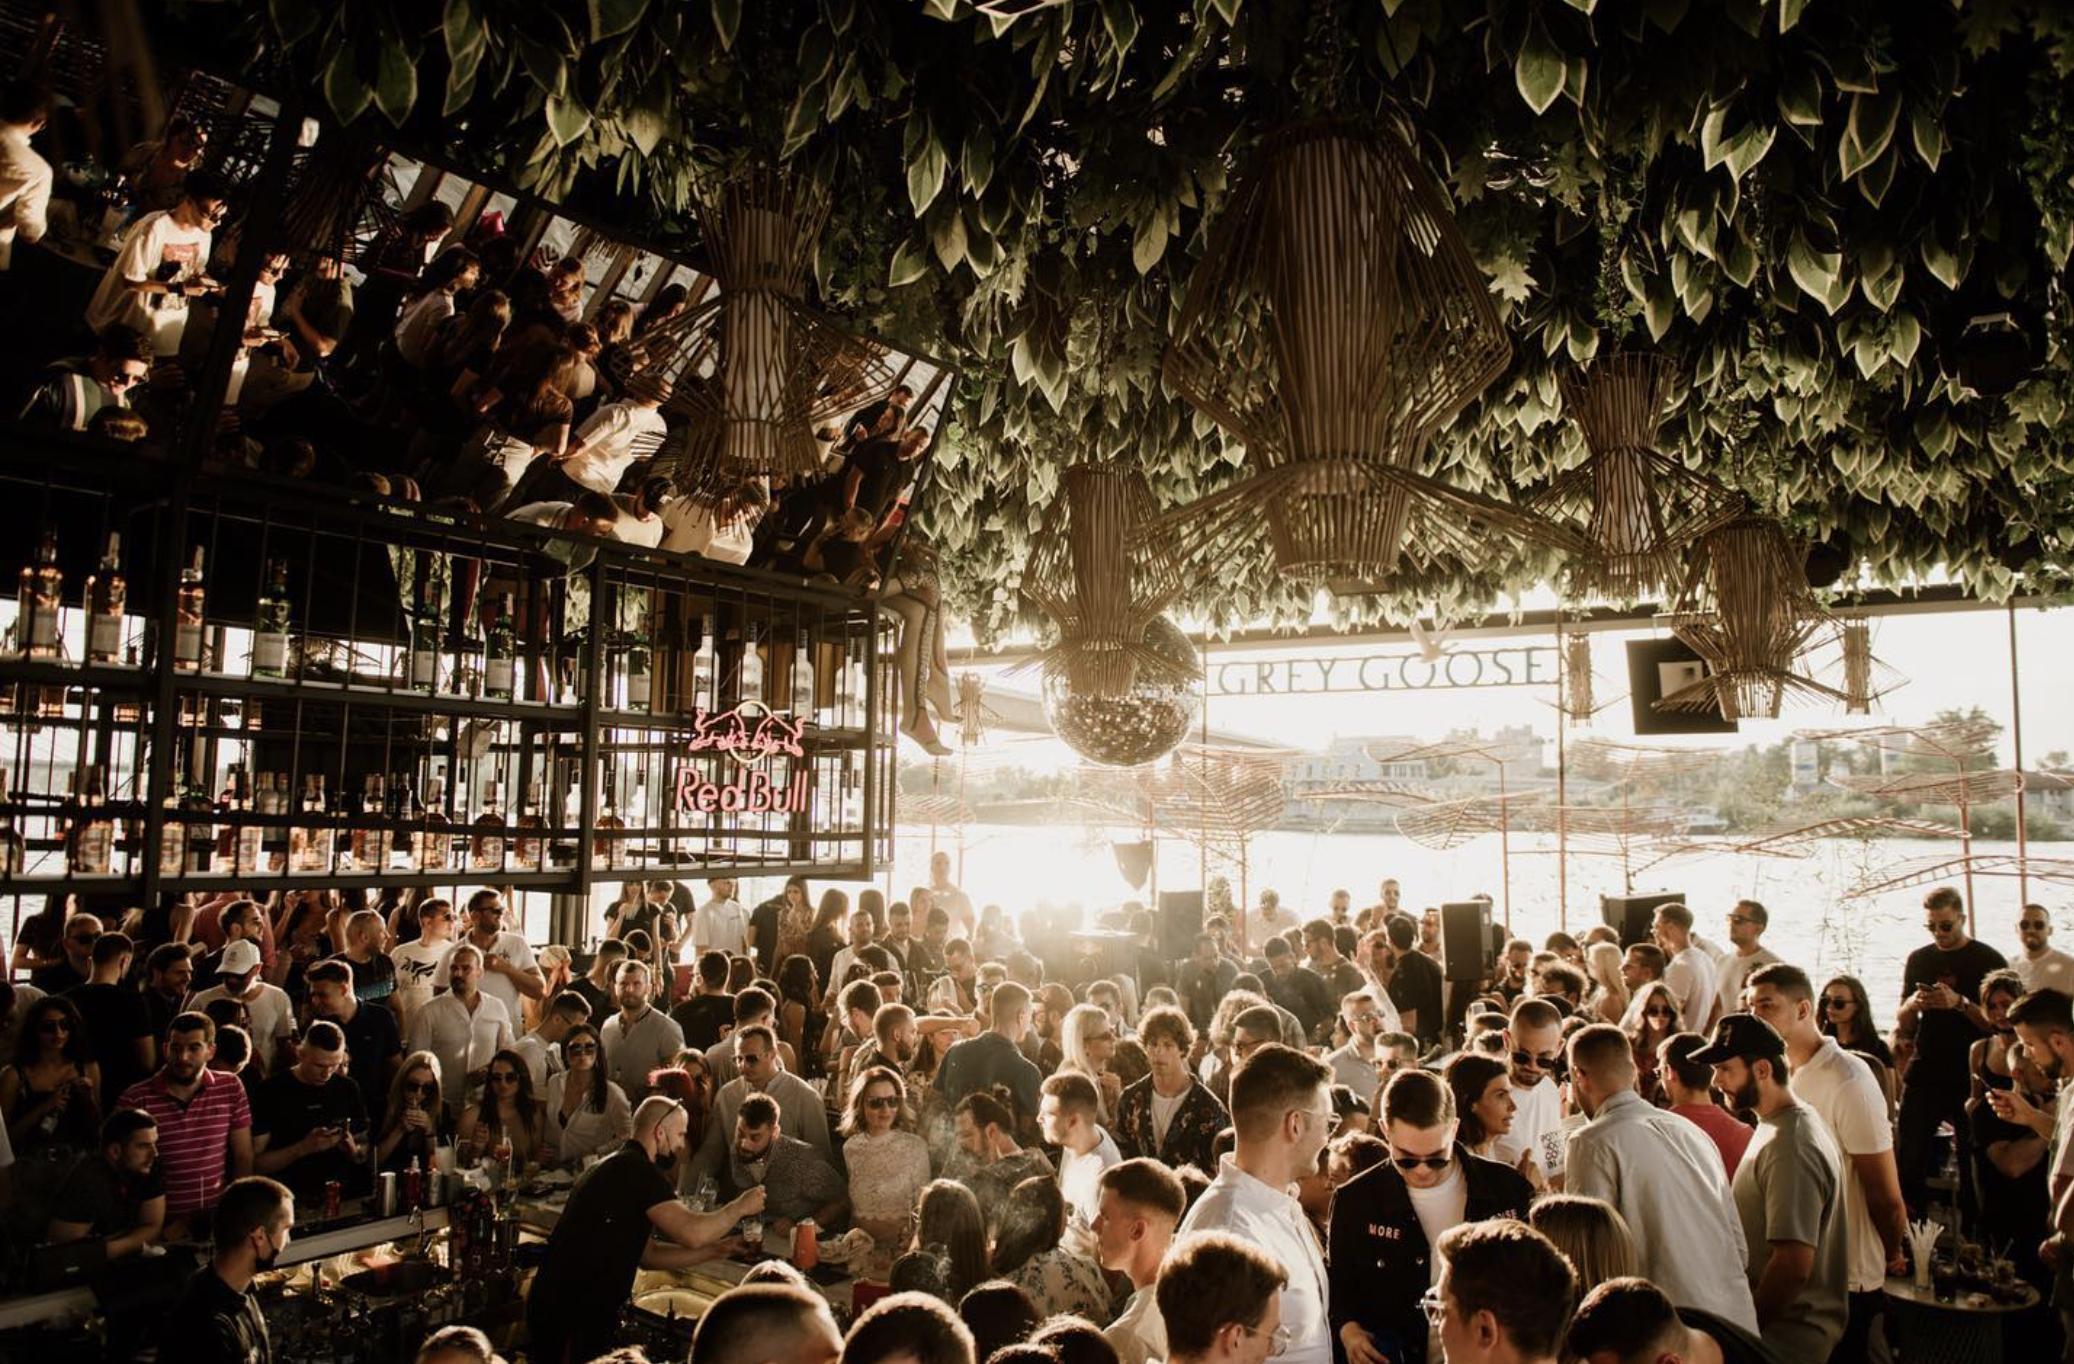 Belgrade People in a Club!